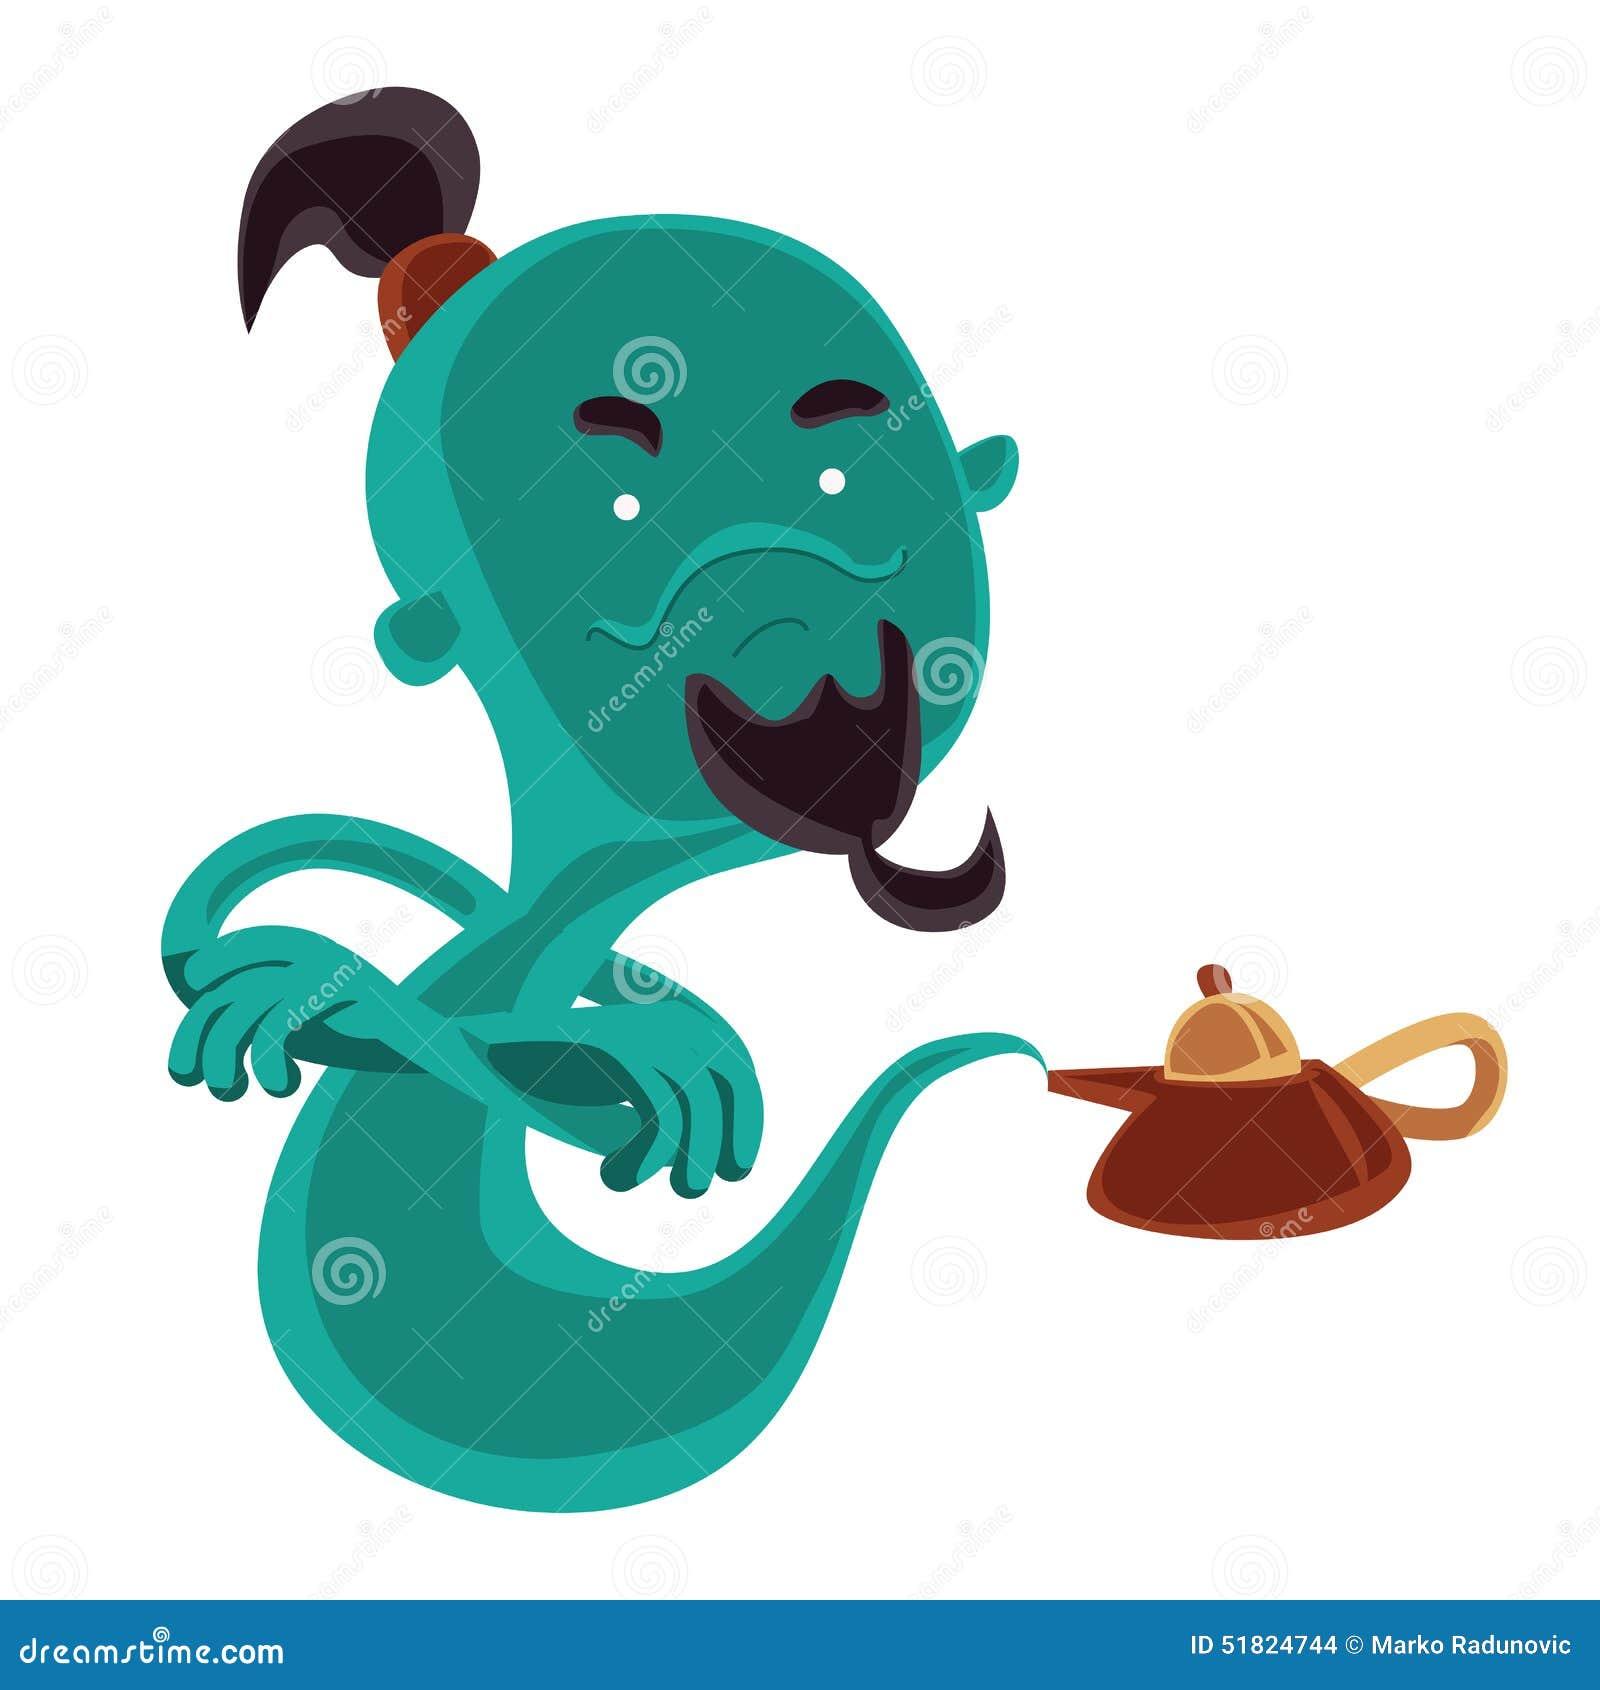 Genie Lamp Illustration